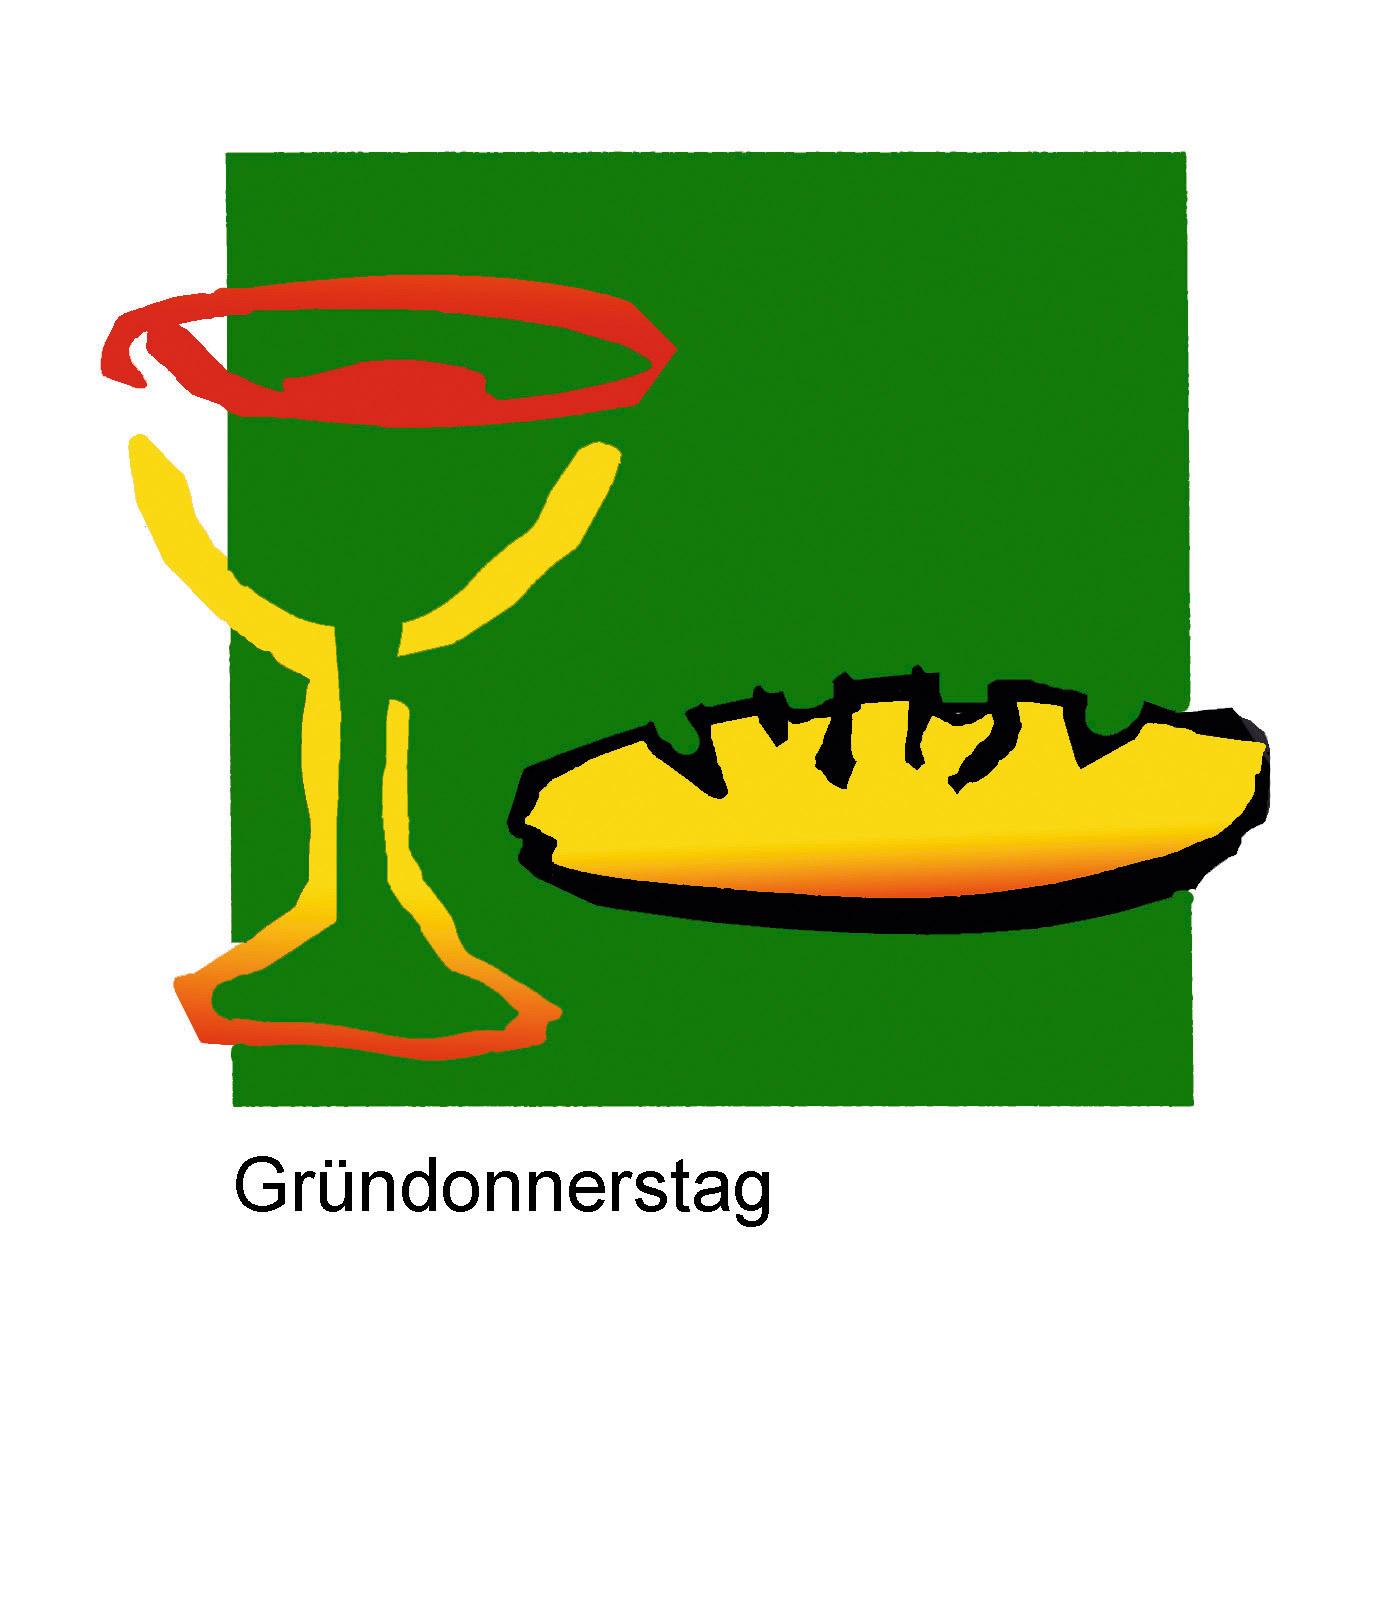 Gründonnerstag 116_4102_RGB